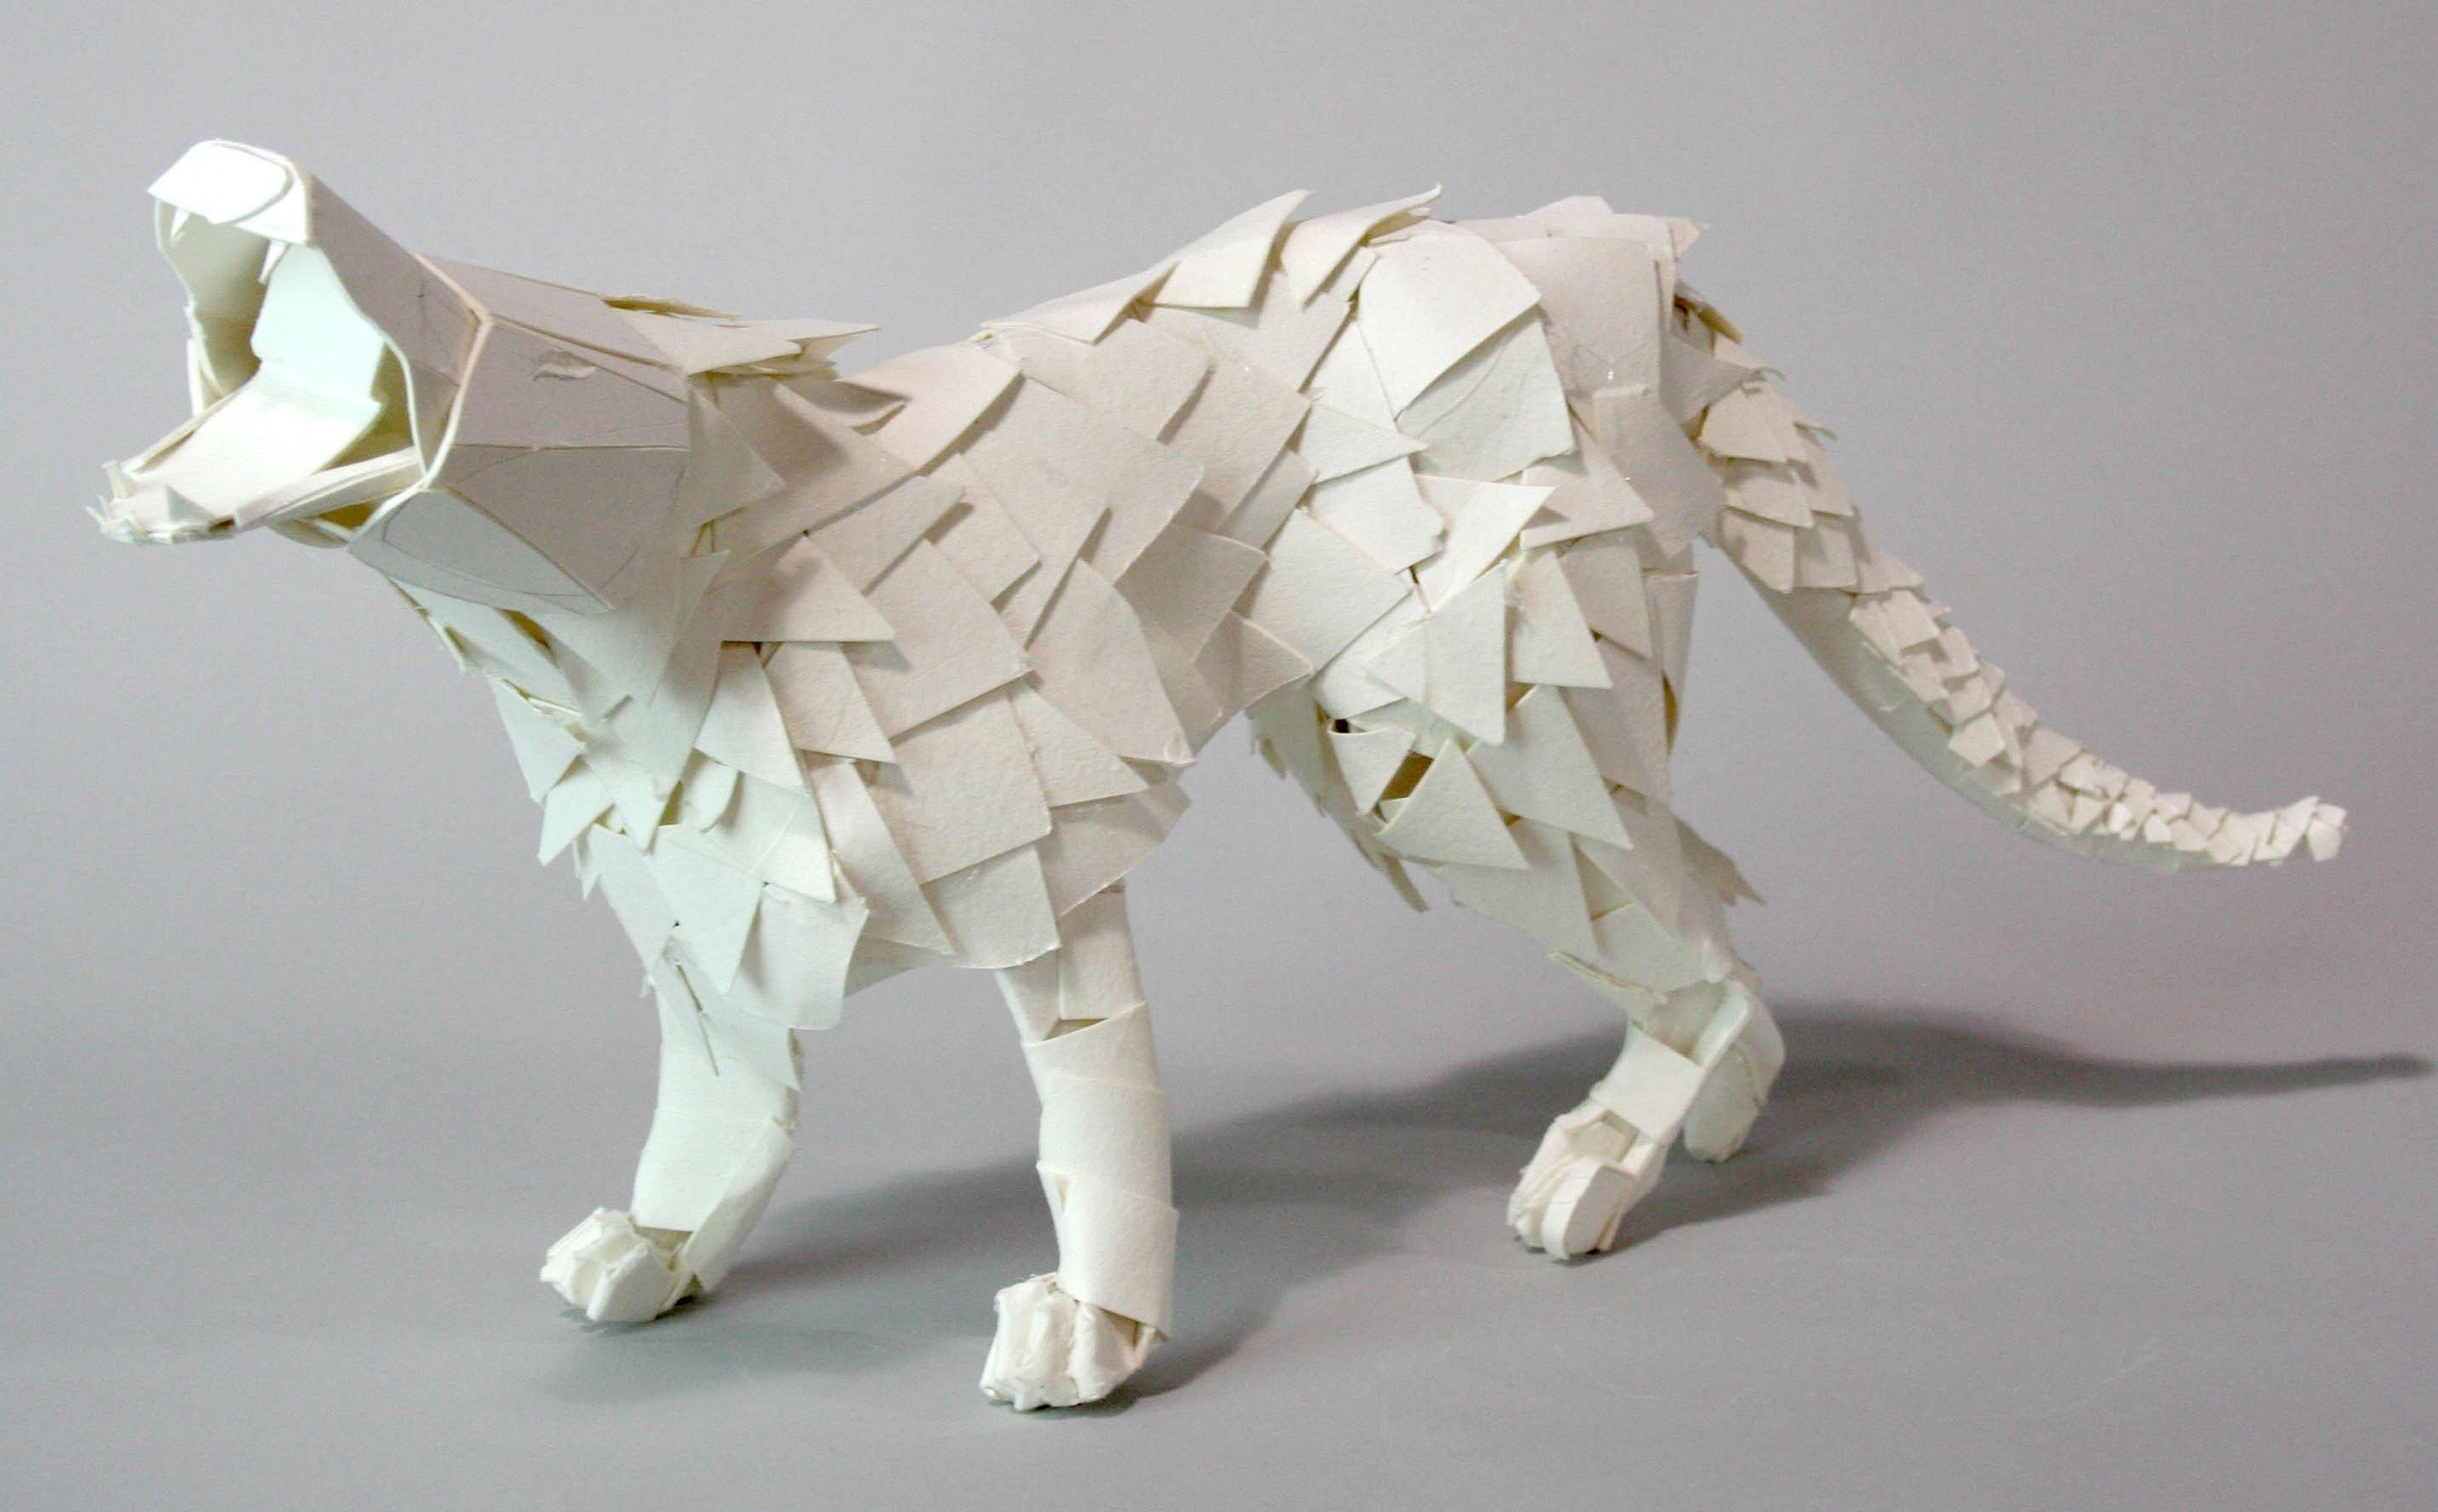 Wolf sculpture made with Taskboard in school art class